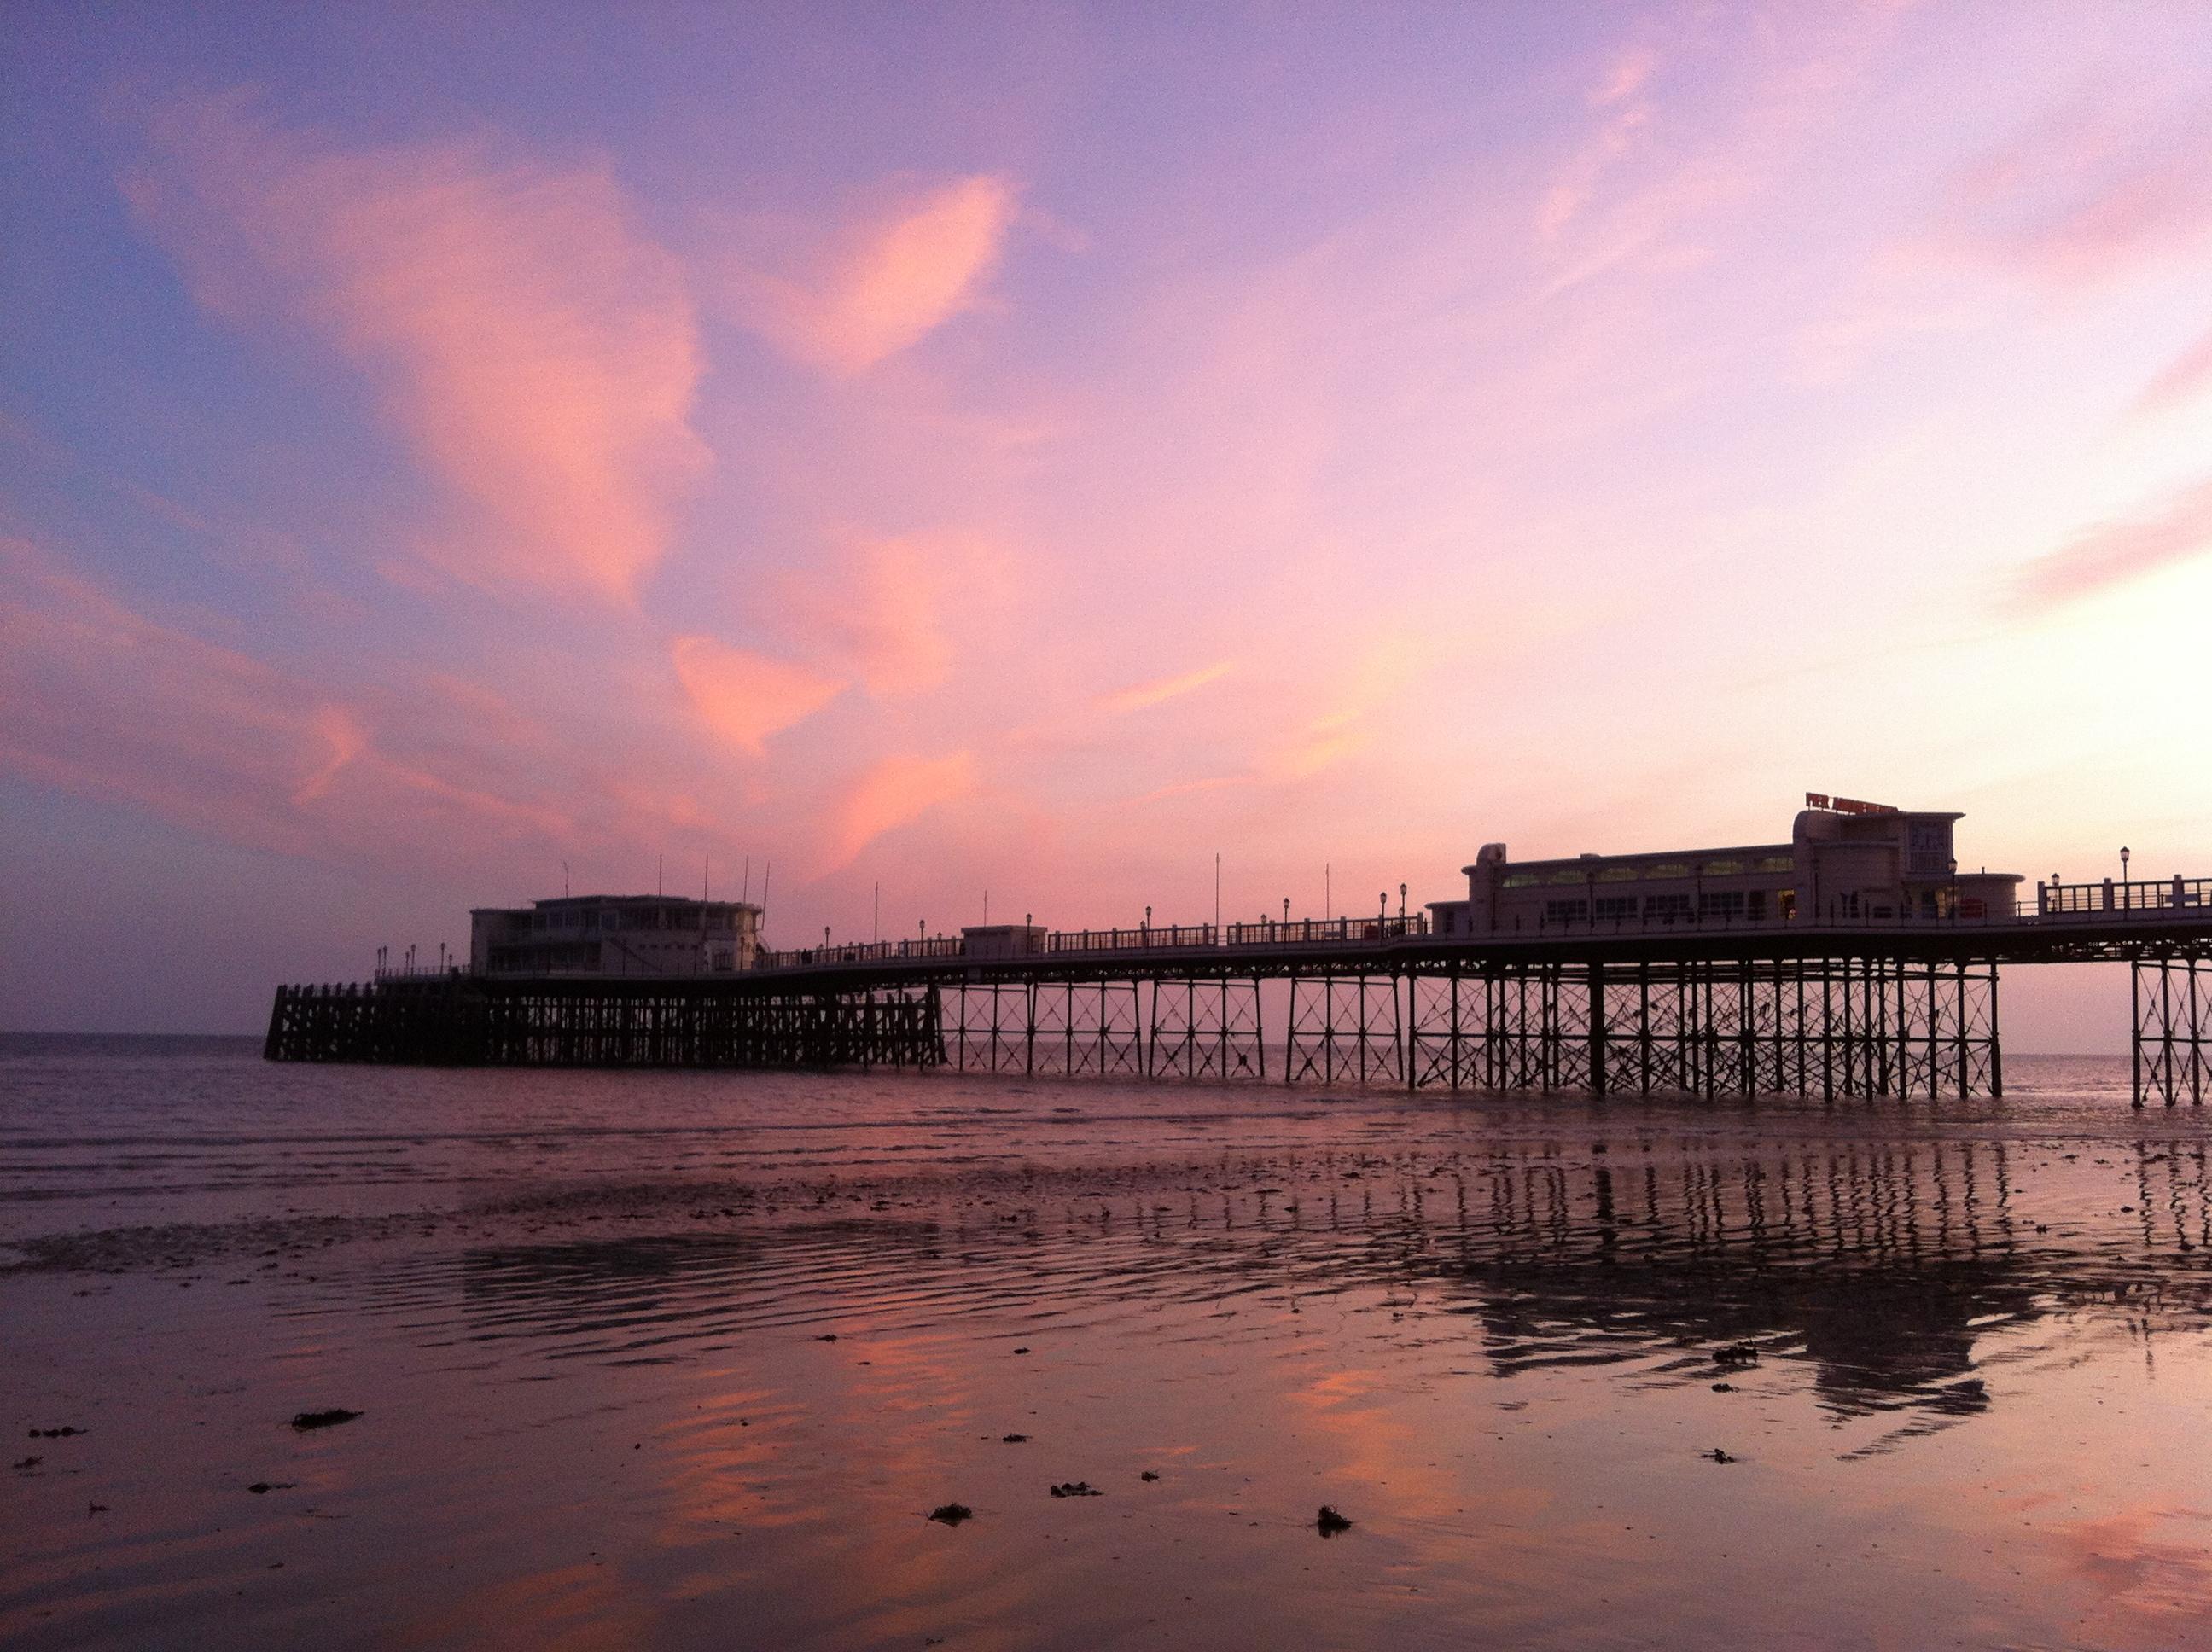 Worthing_Pier_at_sunset,_low_tide.JPG